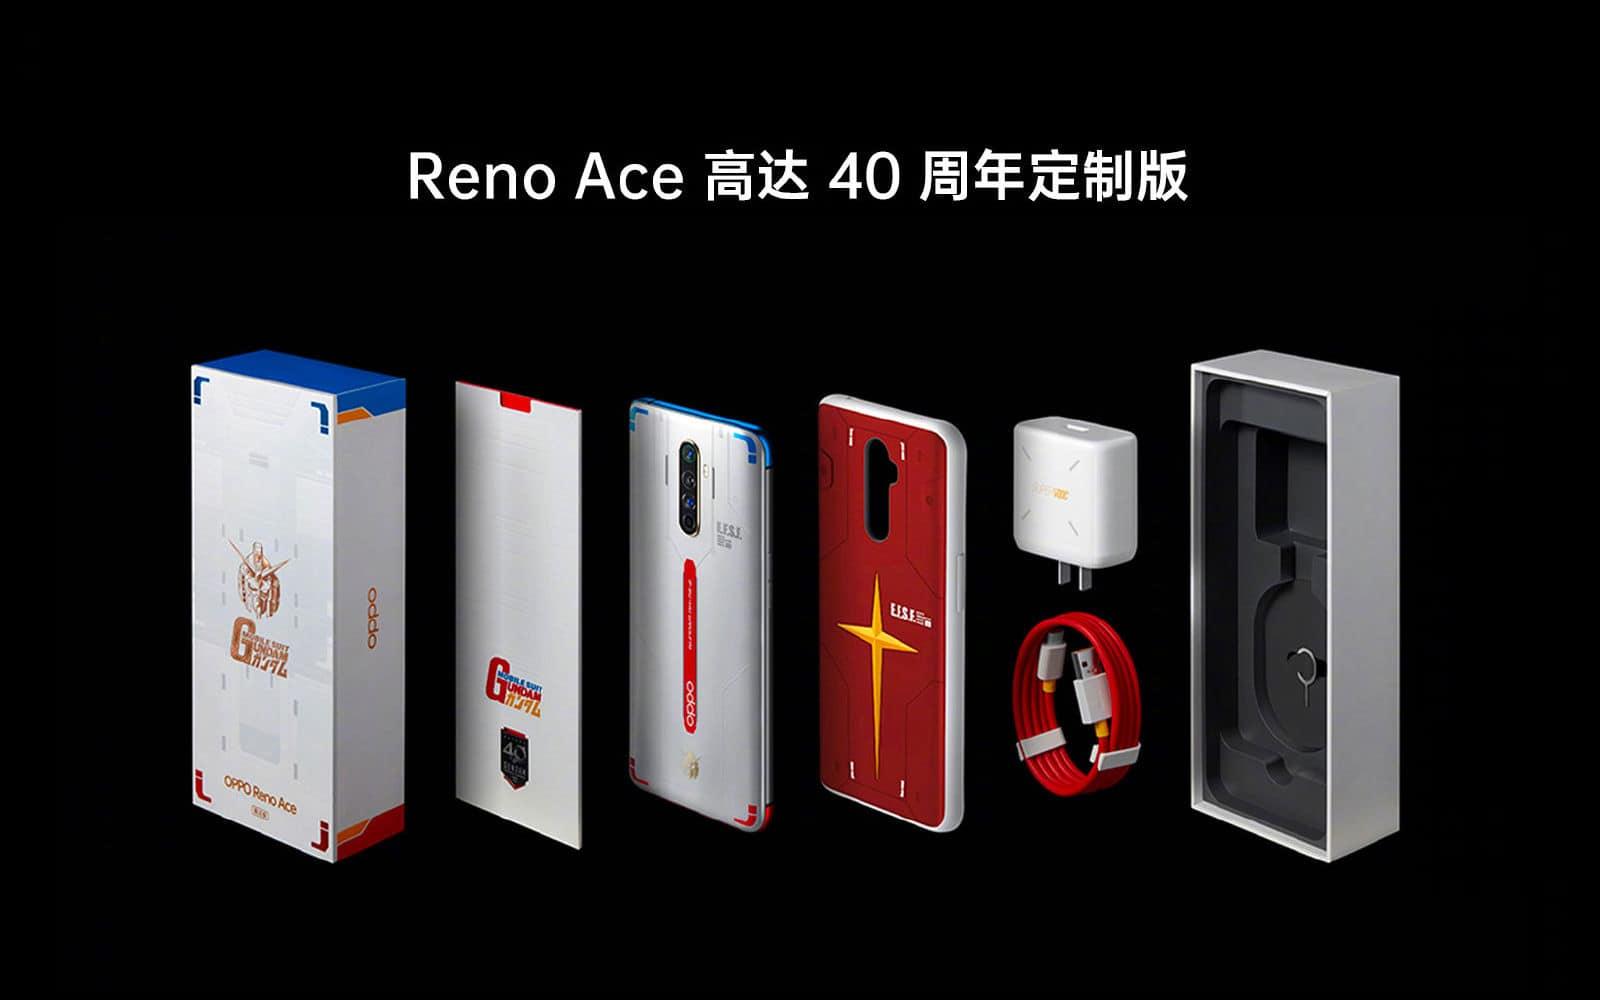 OPPO Reno Ace Gundam Edition